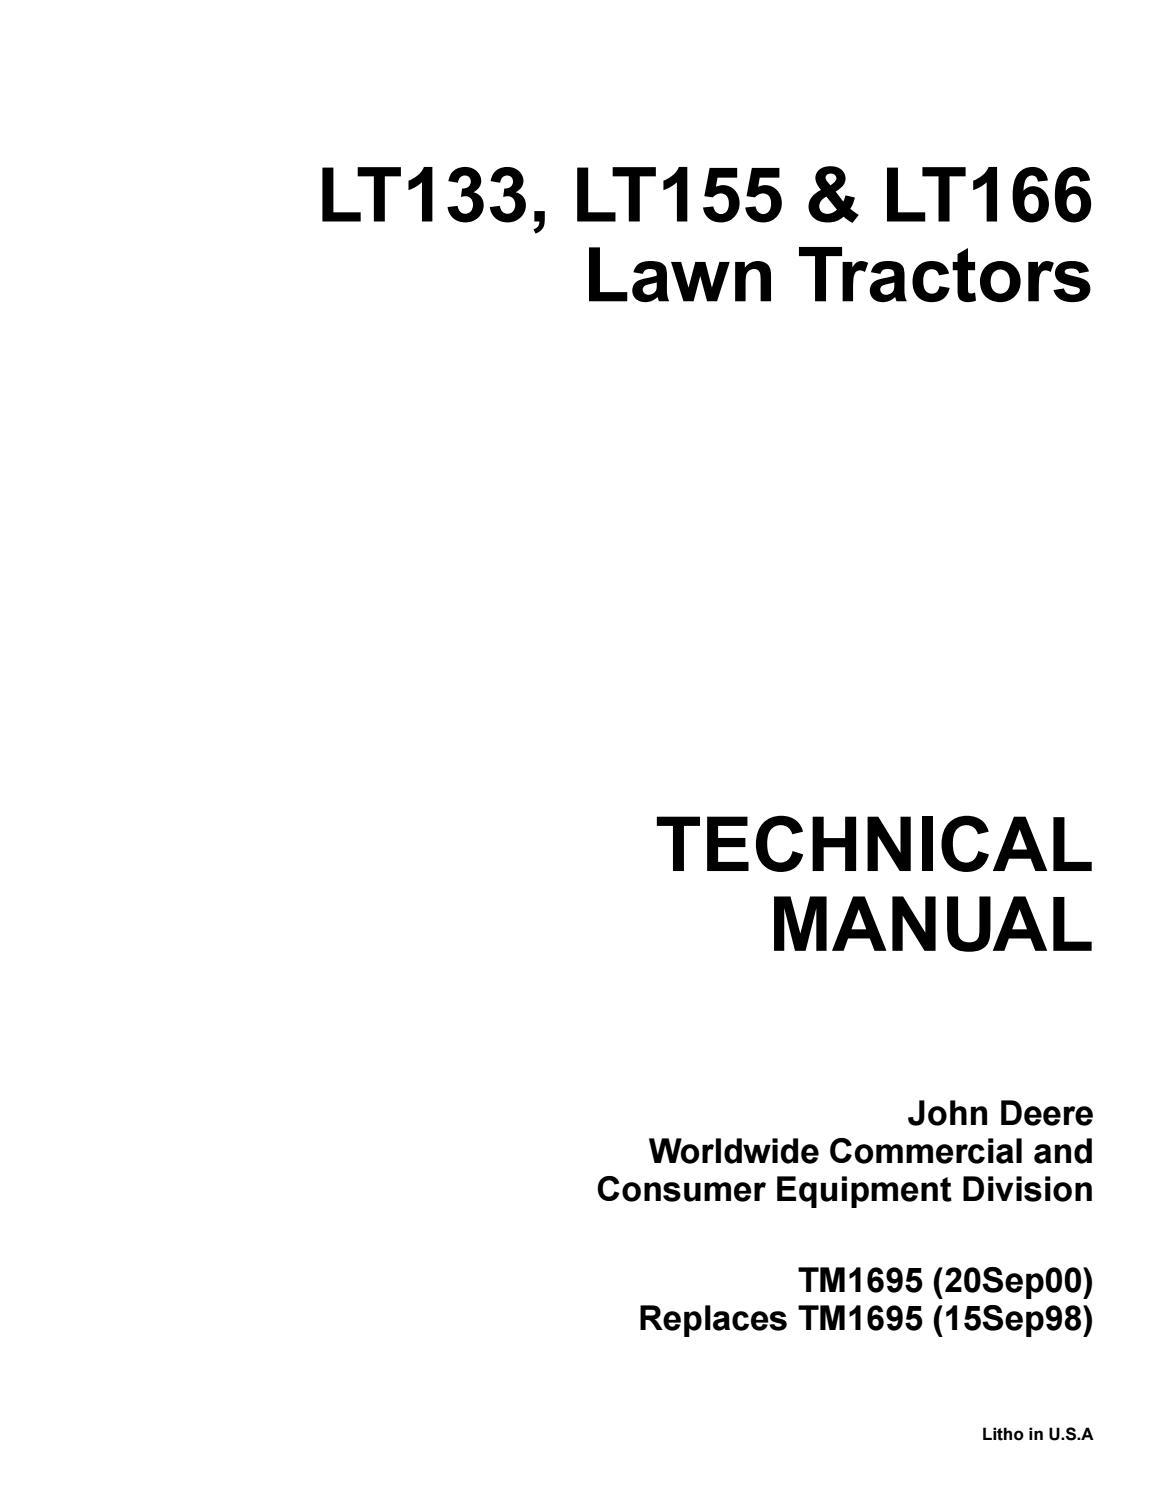 John Deere Lt155 Lawn Garden Tractor Service Repair Manual By 260 Alternator Wiring Diagram Ujfjisefjj Issuu